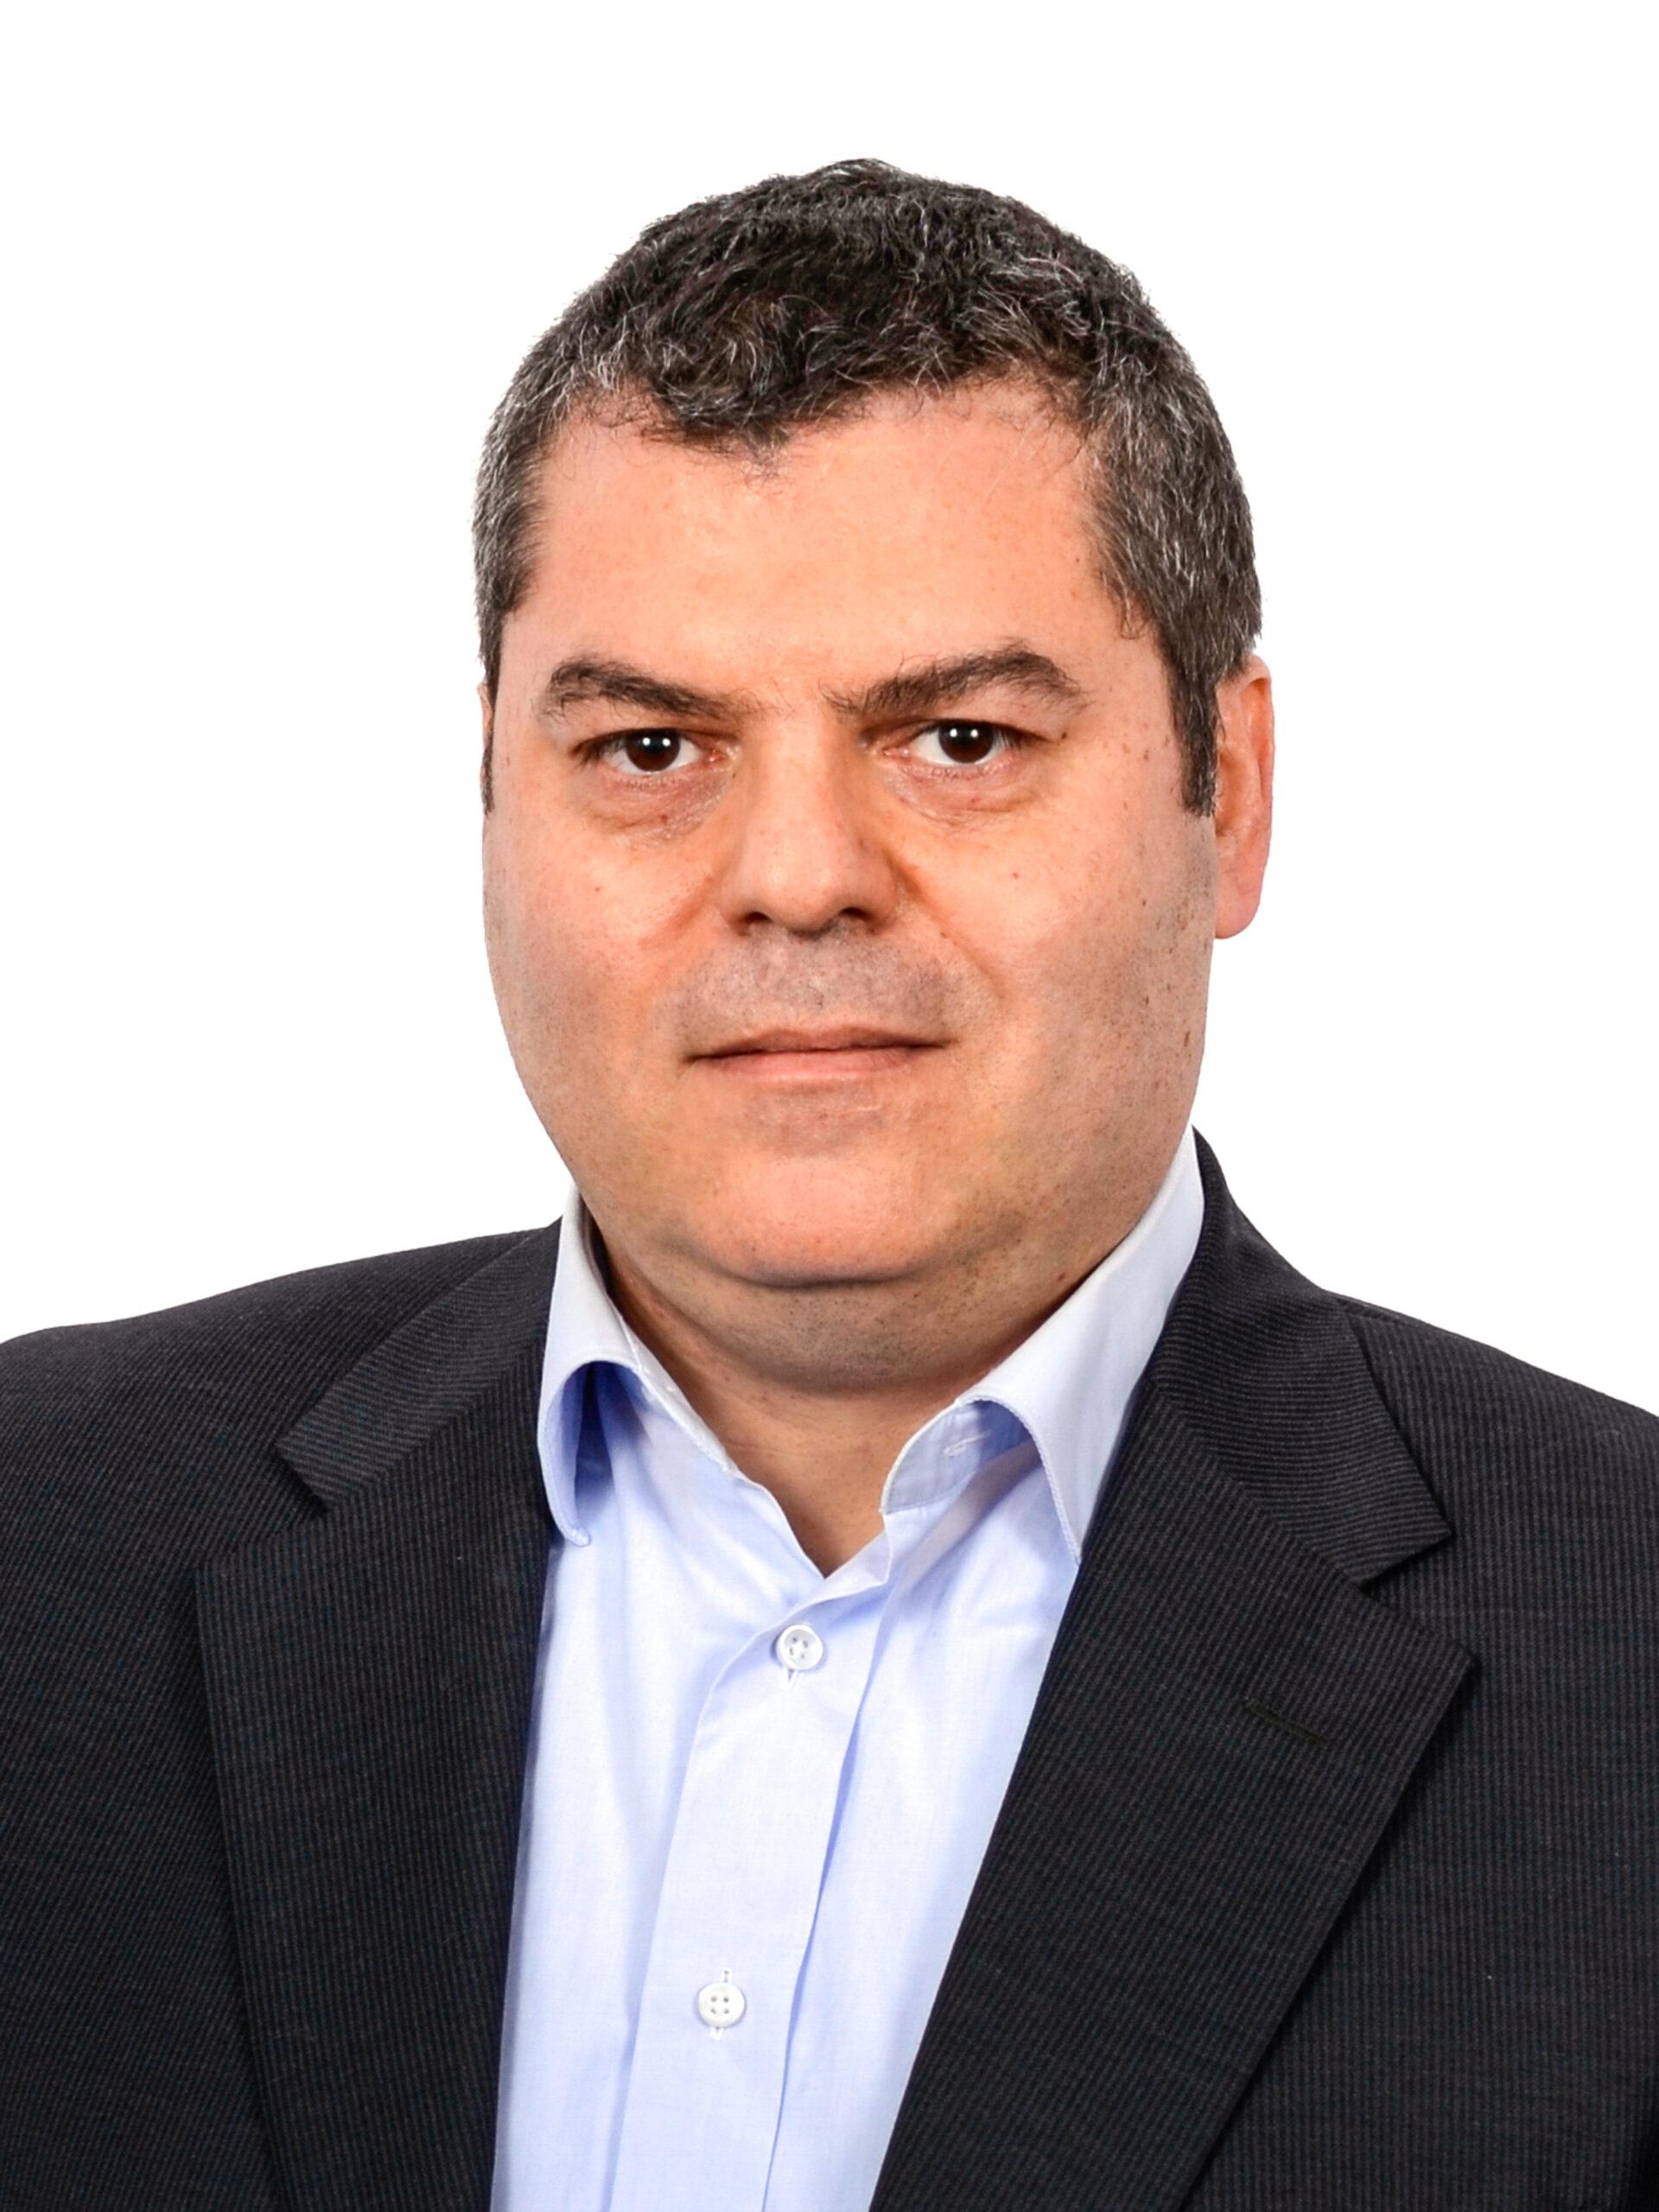 Giuseppe Farinato, Business Development Manager Italy am PI Berlin